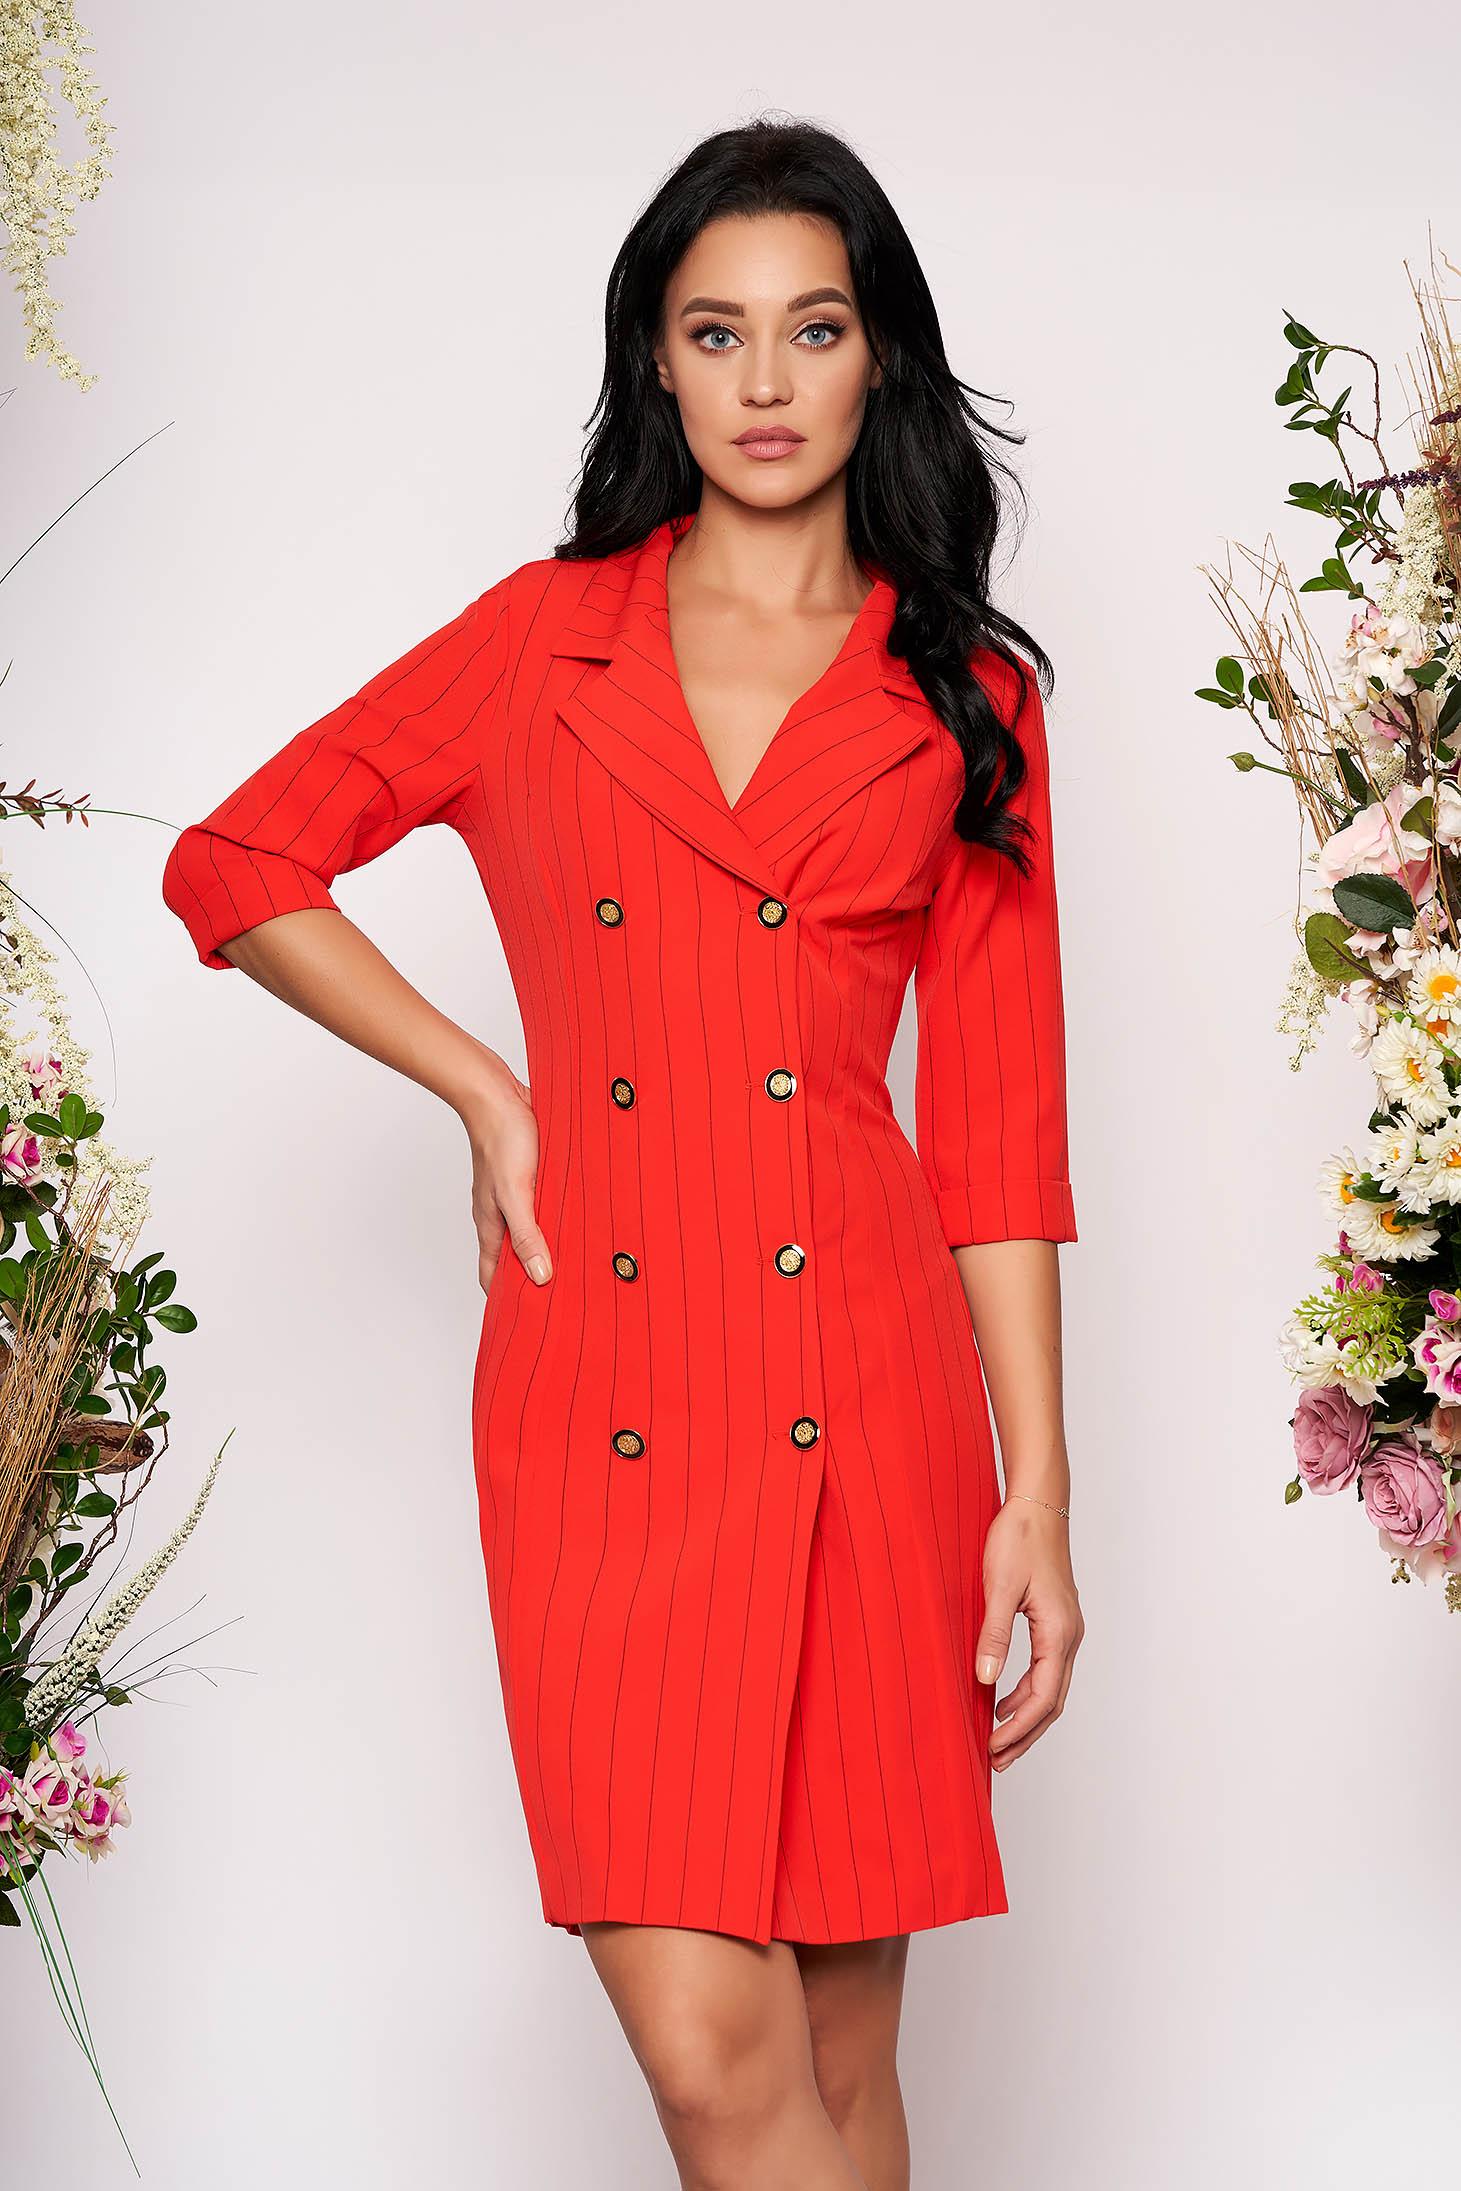 Fofy red short cut elegant office dress blazer type slightly elastic fabric with v-neckline